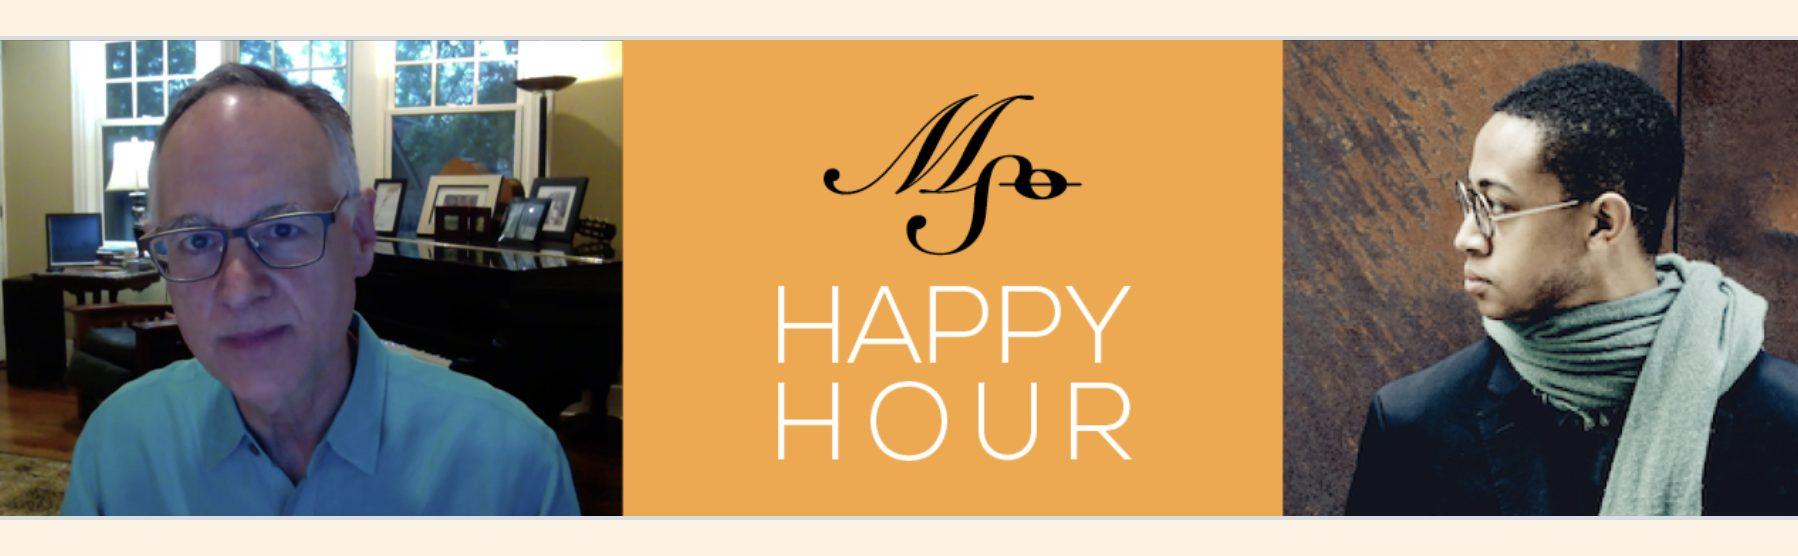 MSO Happy Hour: William Garfield Walker